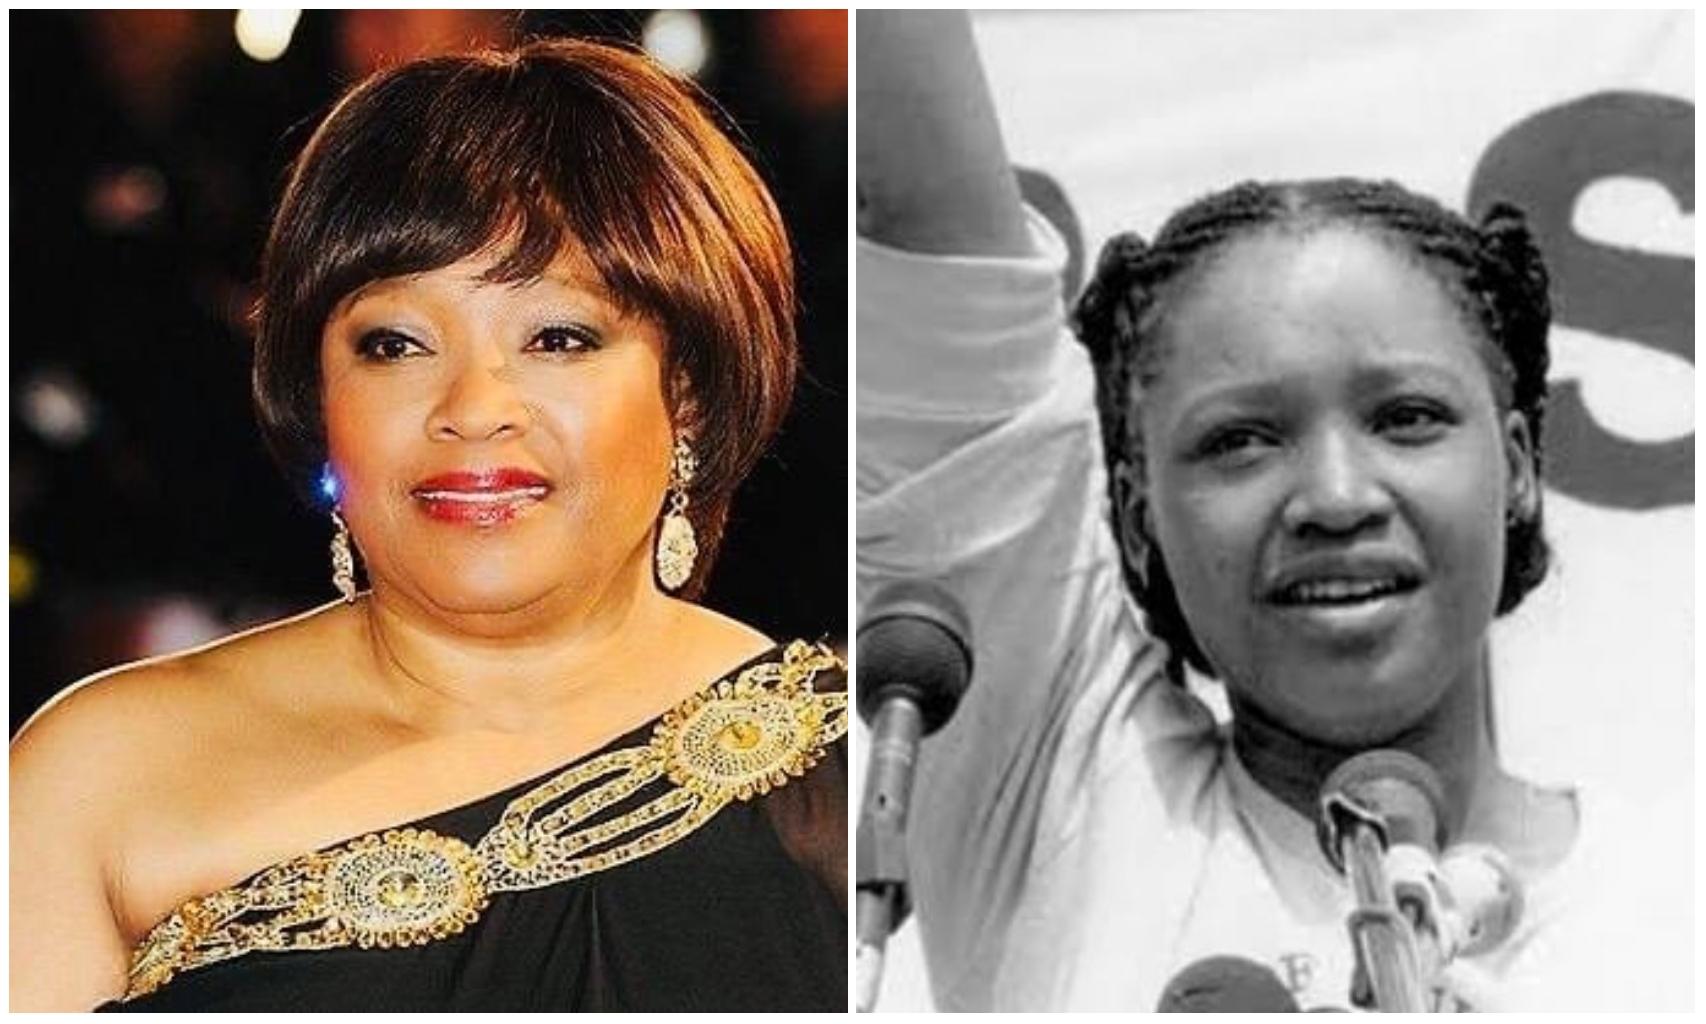 Nelson Mandela's daughter, Zindzi Mandela passes away aged 59